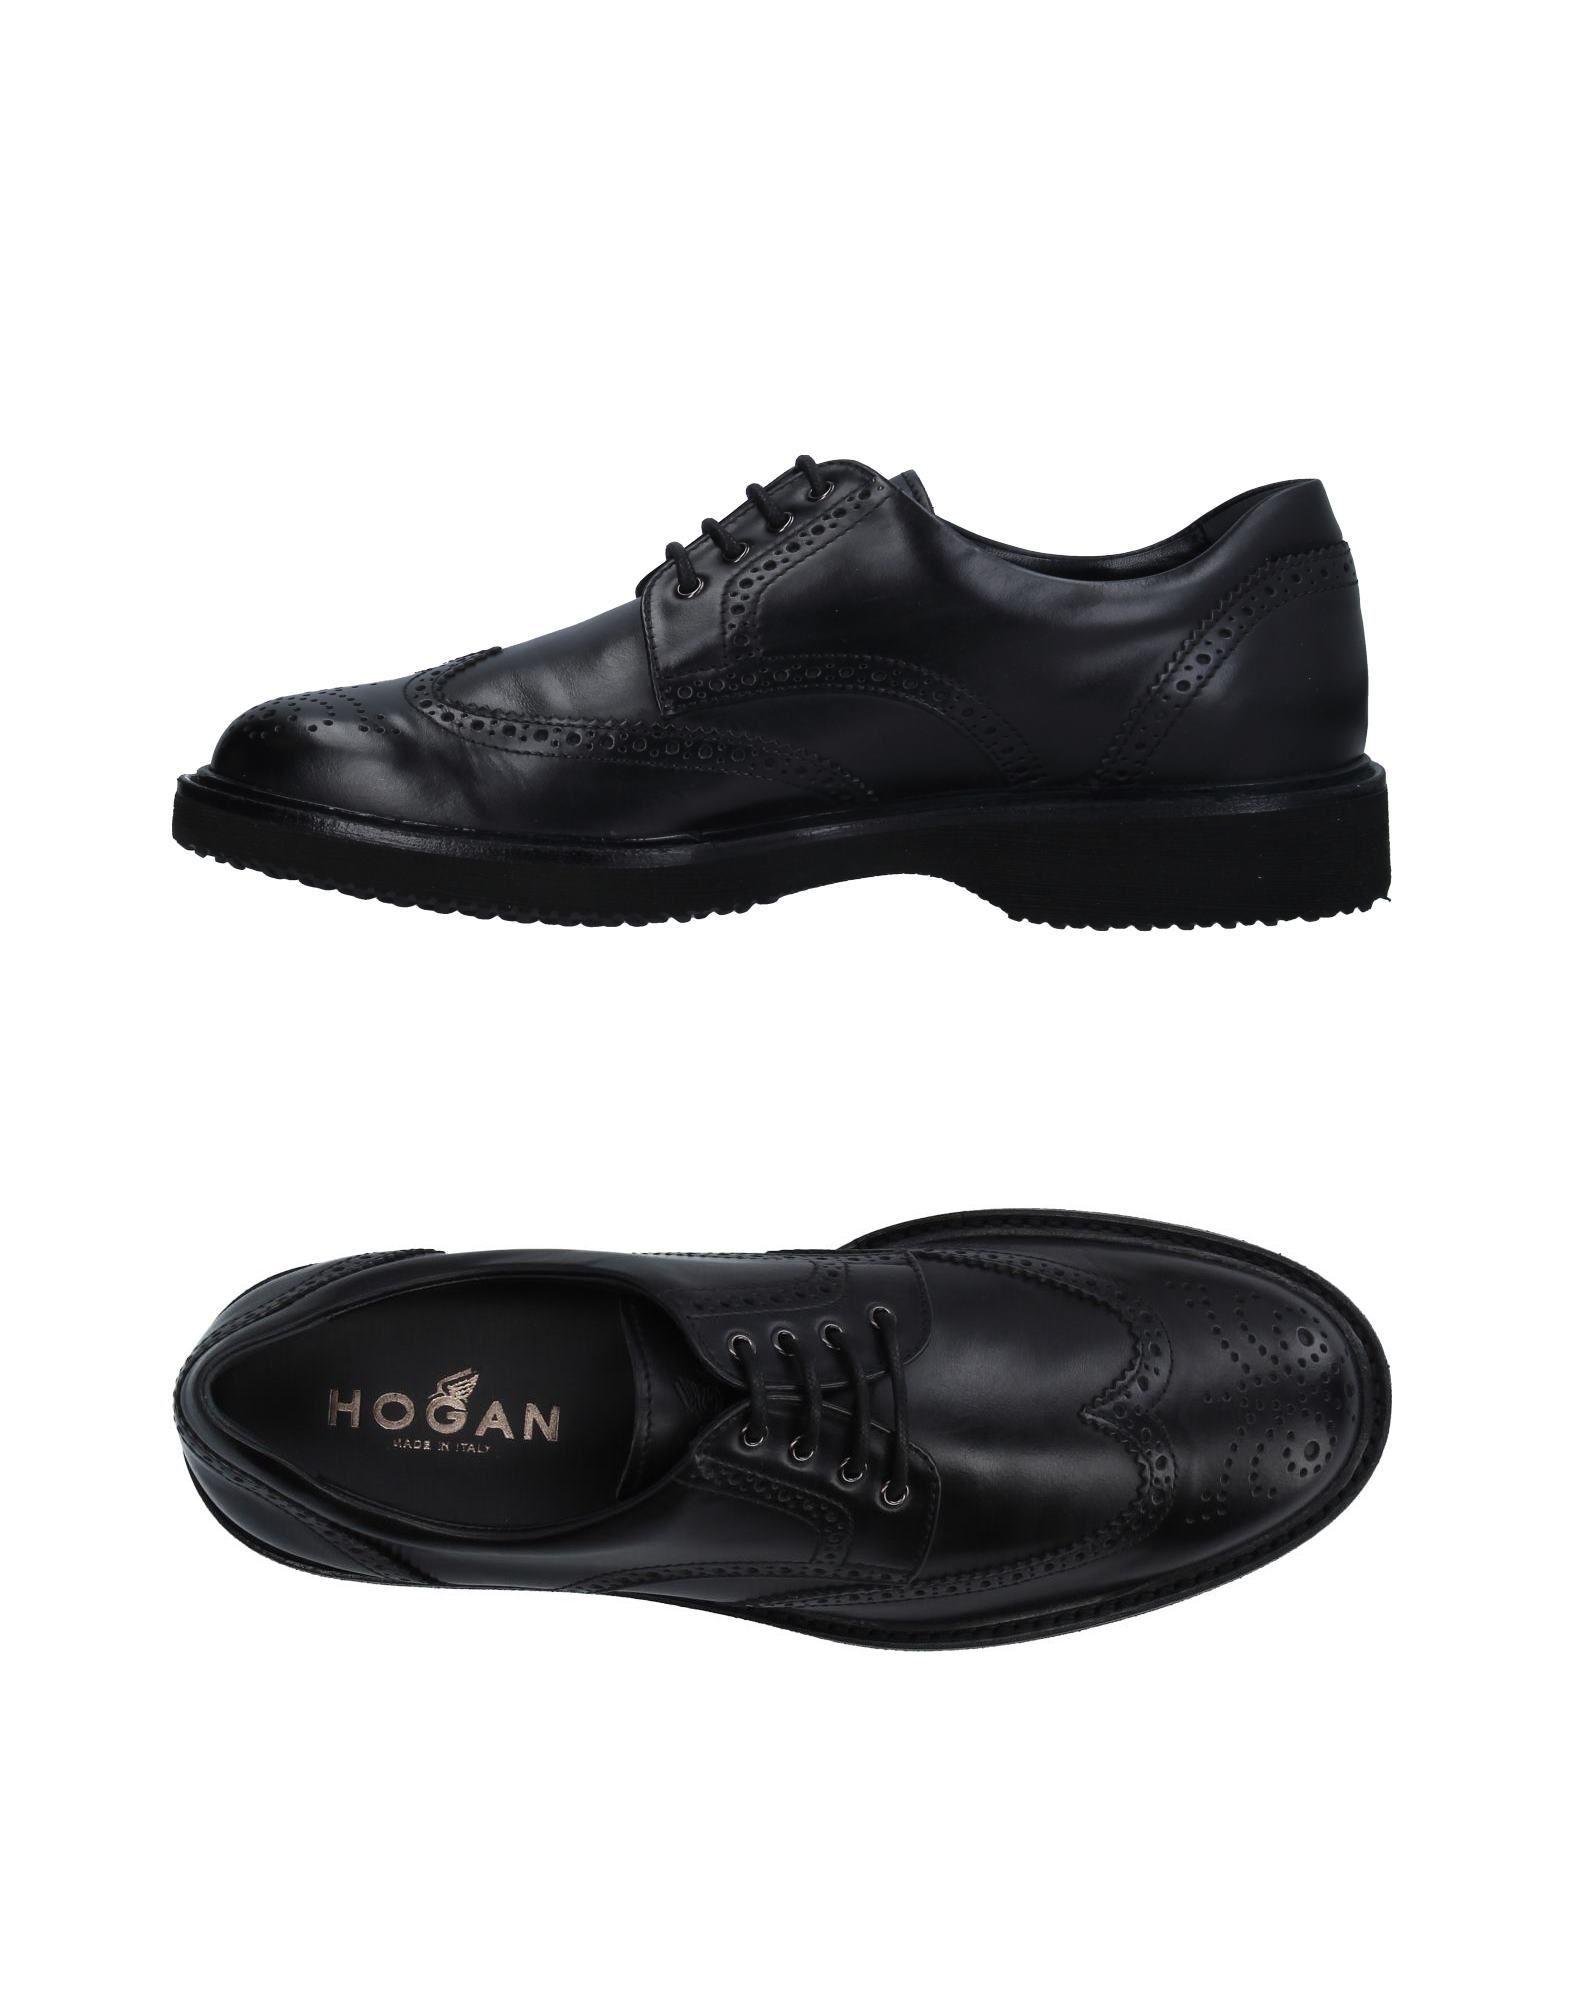 Hogan Schnürschuhe Herren  11297213QT Gute Qualität beliebte Schuhe